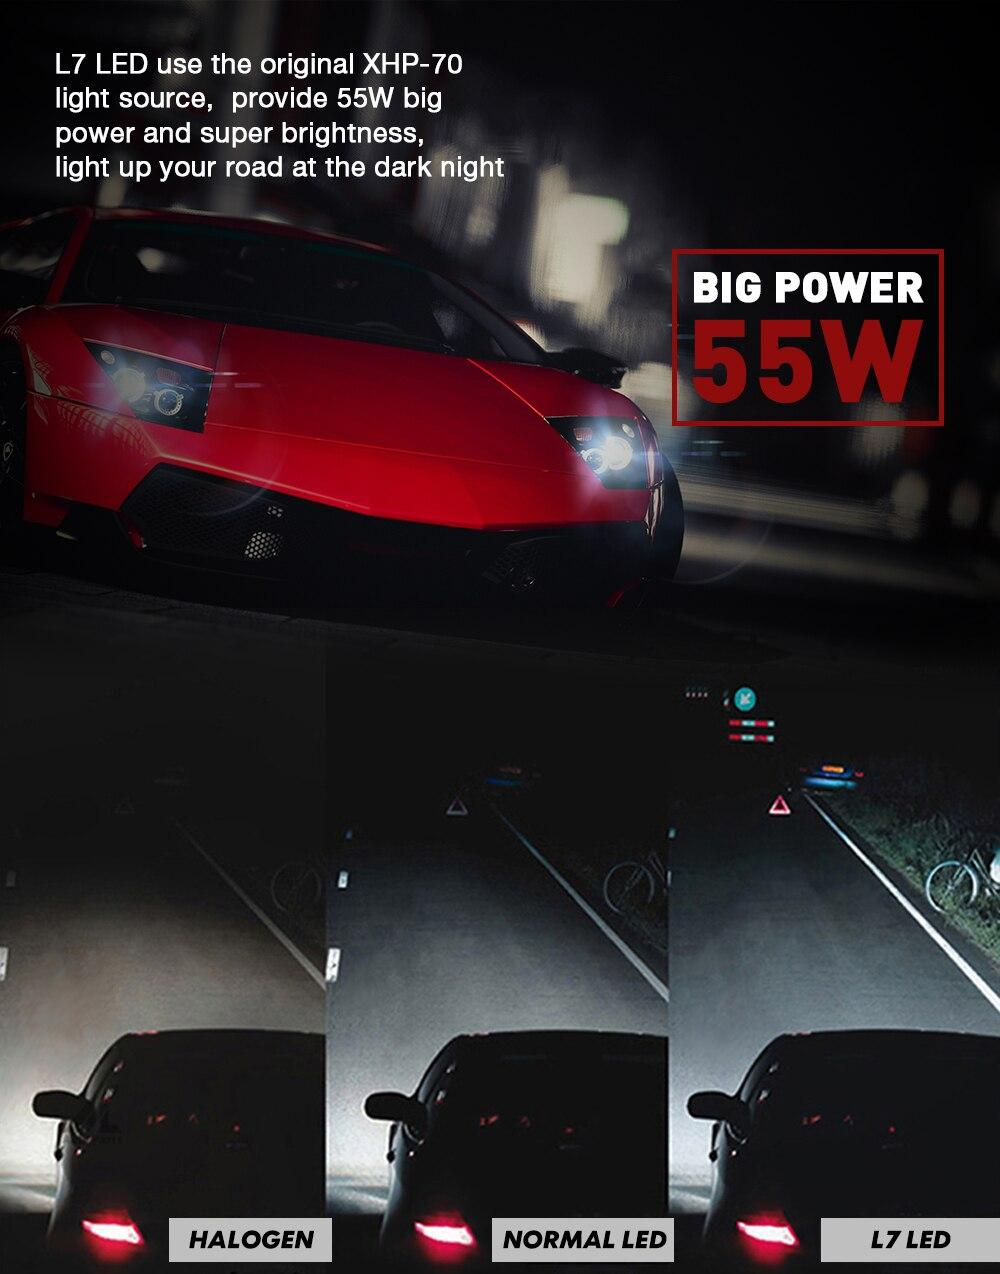 Xenplus H7 ampoule LED 110W 13200lm 12V Cree XHP70 Puces L7 phares Automatiques H4 H11 D2S HB3 HB4 9004 9007 H13 lampe lumineuse Superbe - 6